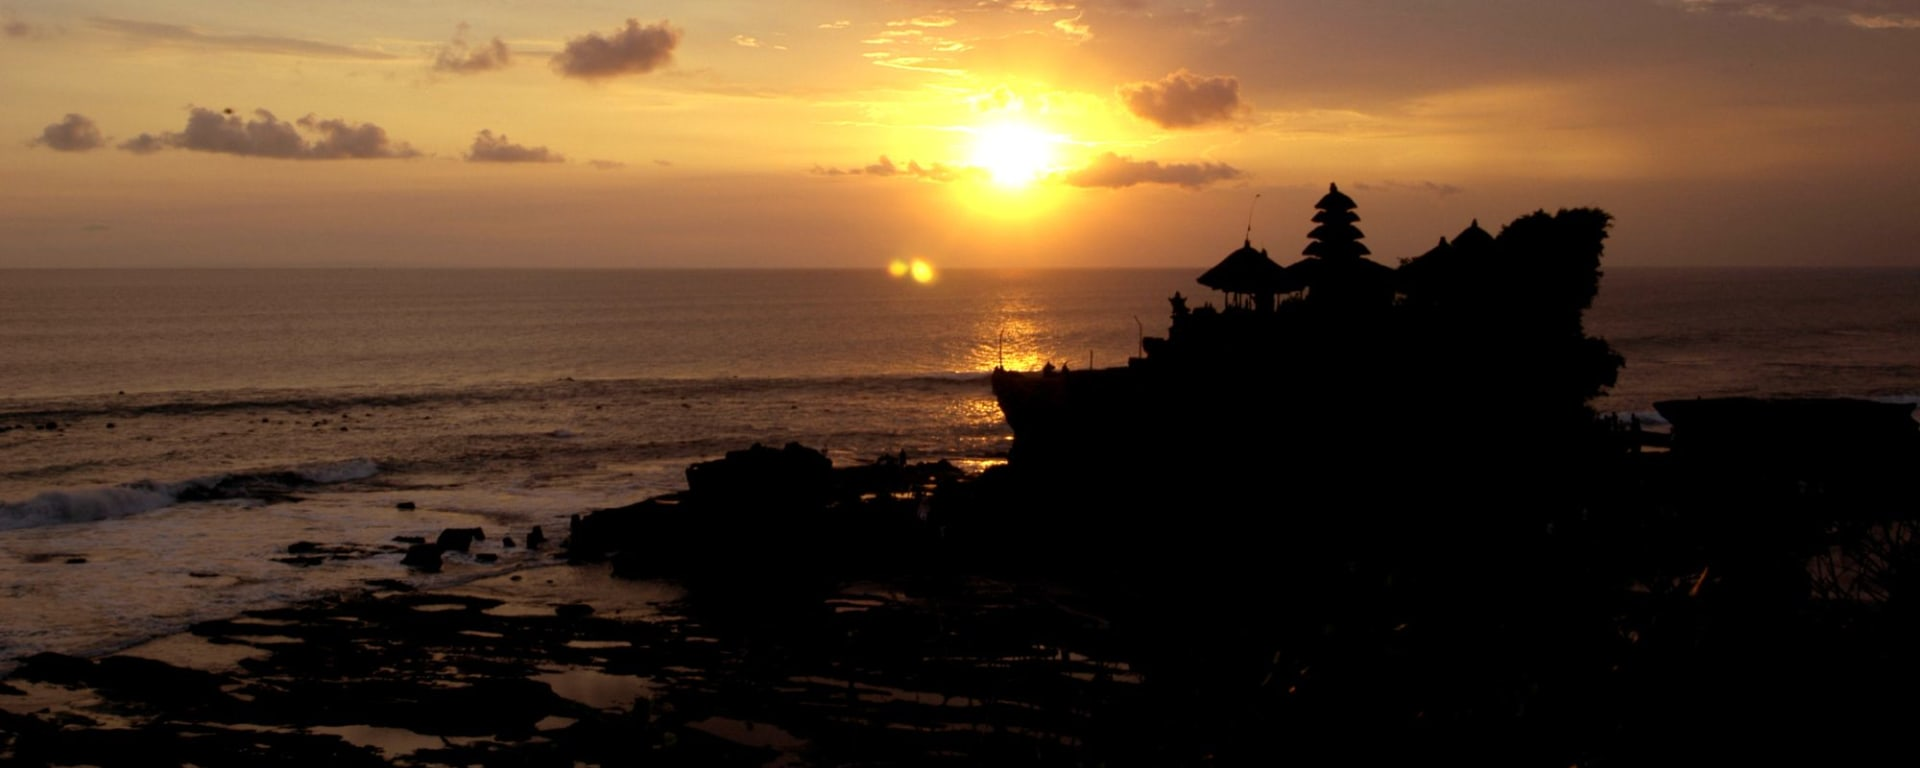 Tanah Lot à Sud de Bali: Bali Tanah Lot